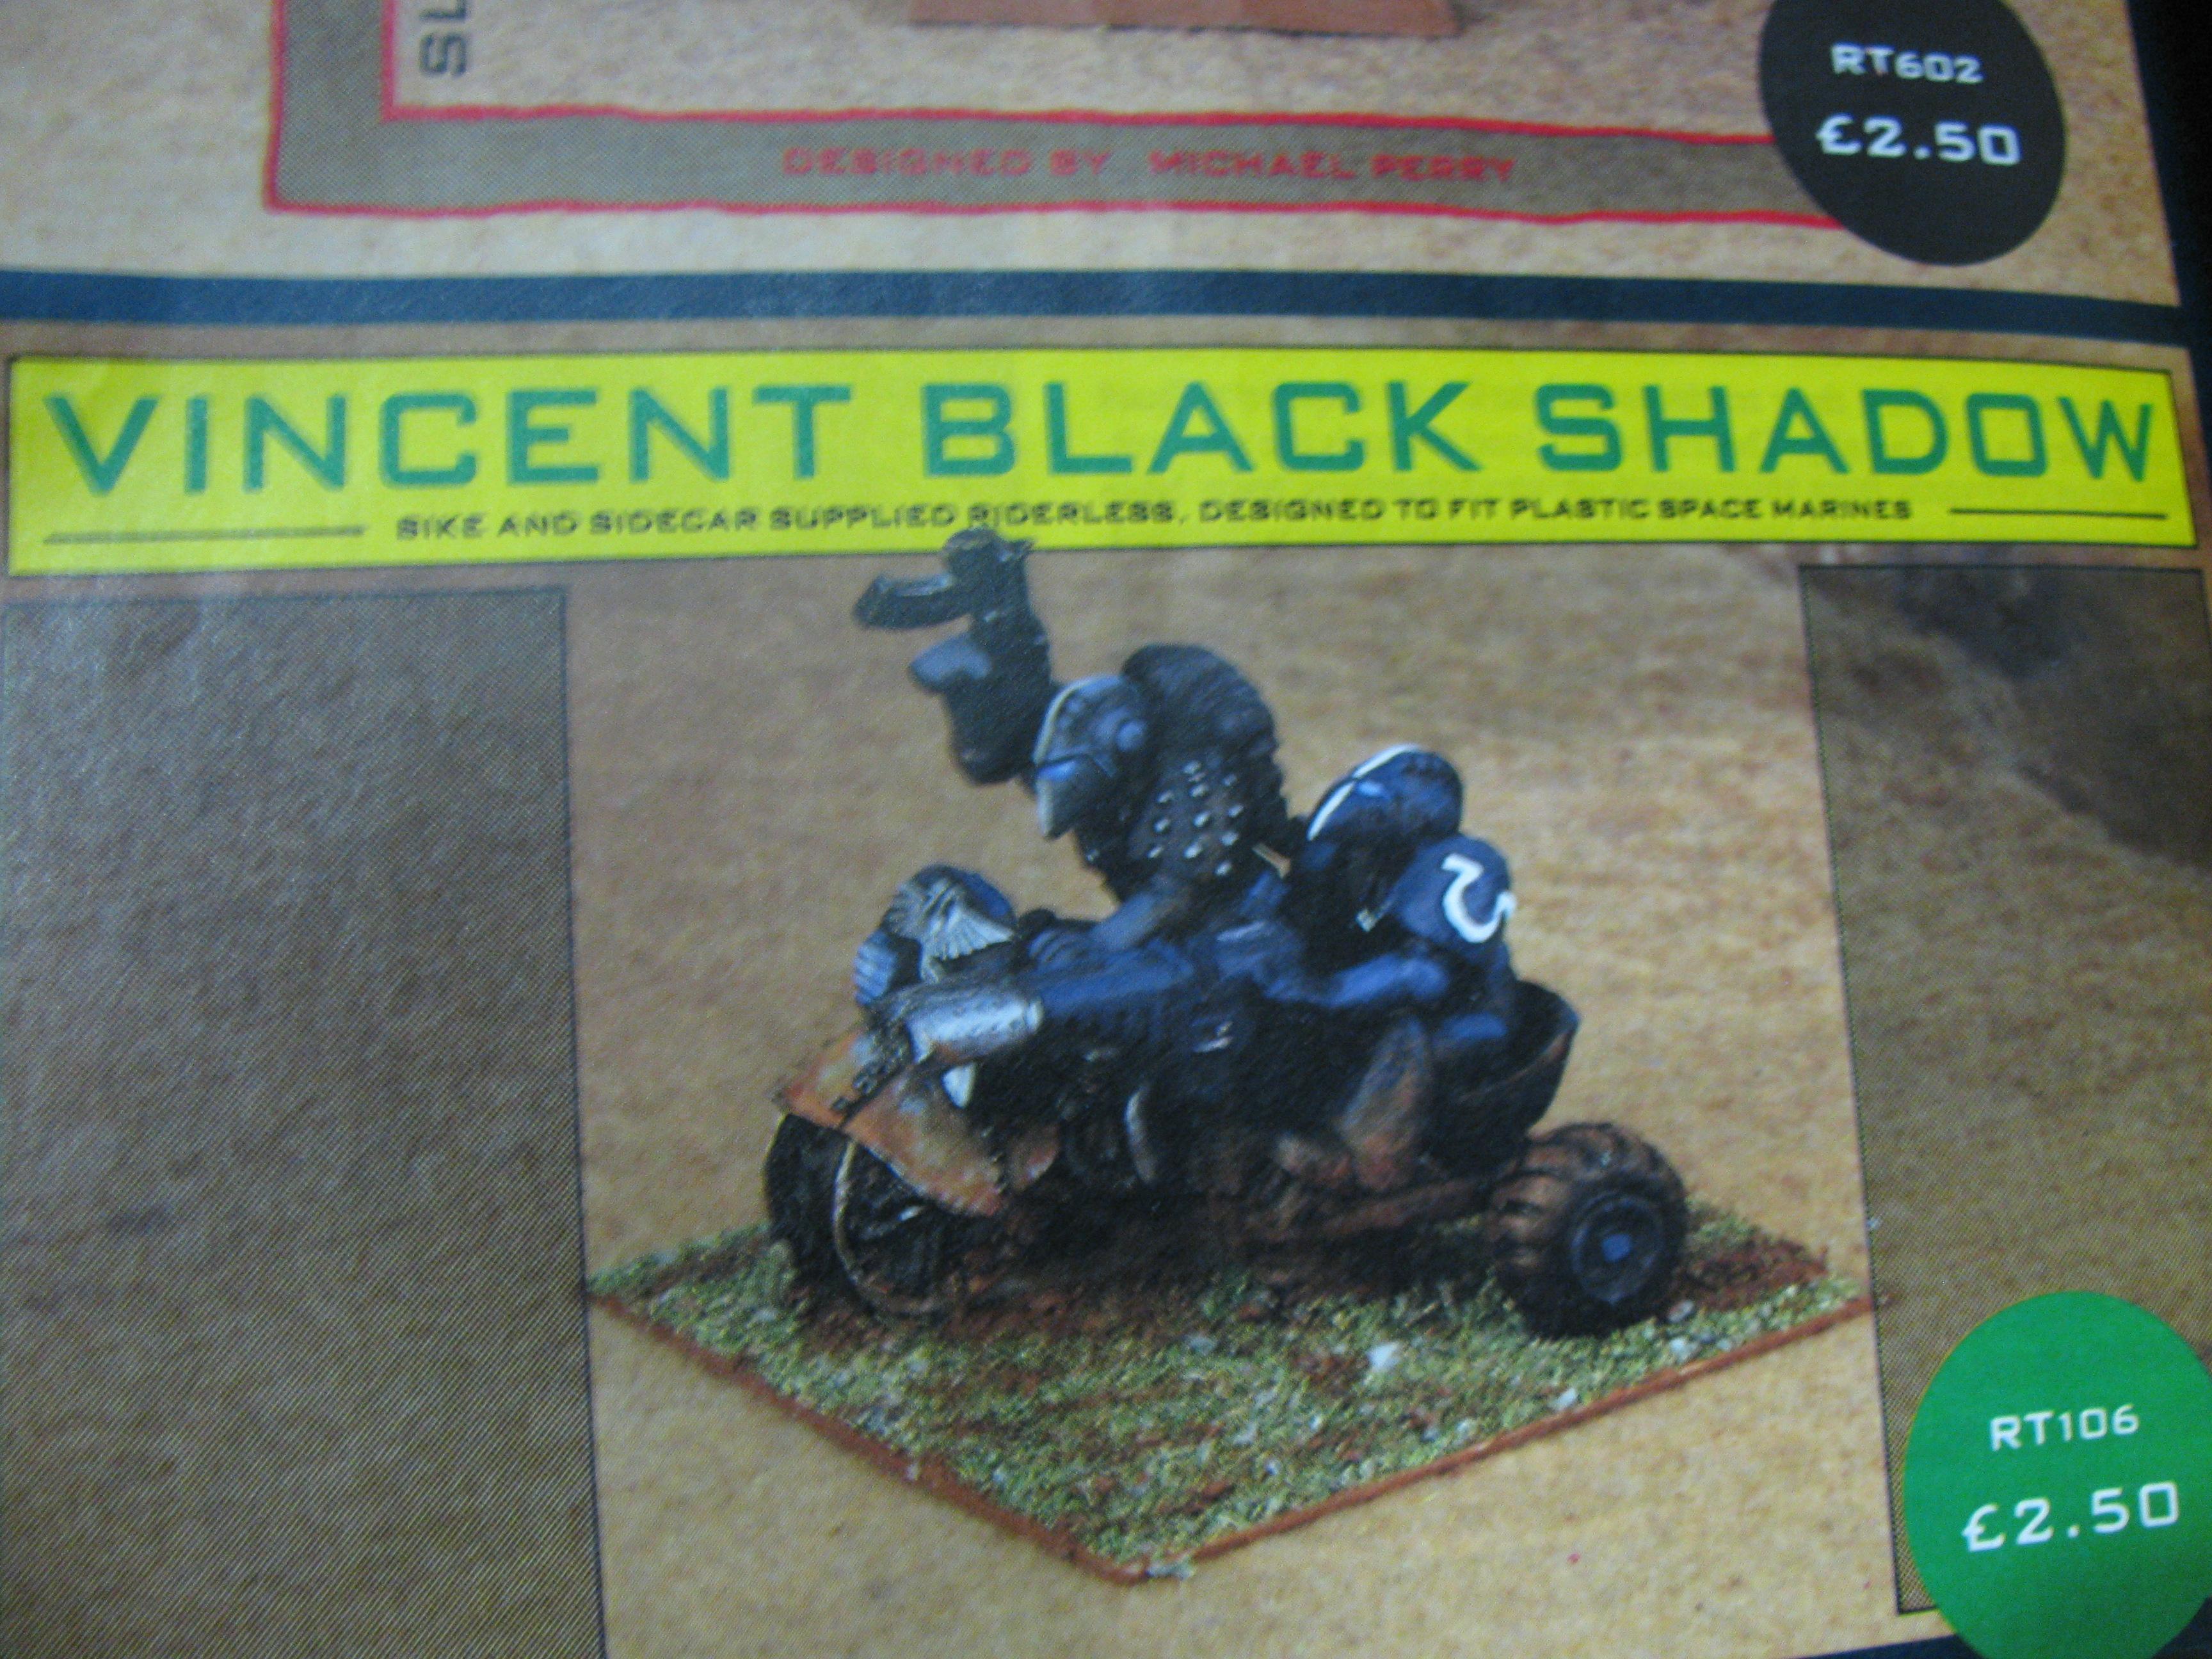 Bike, Copyright Games Workshop, Rogue Trader, Space Marines, Warhammer 40,000